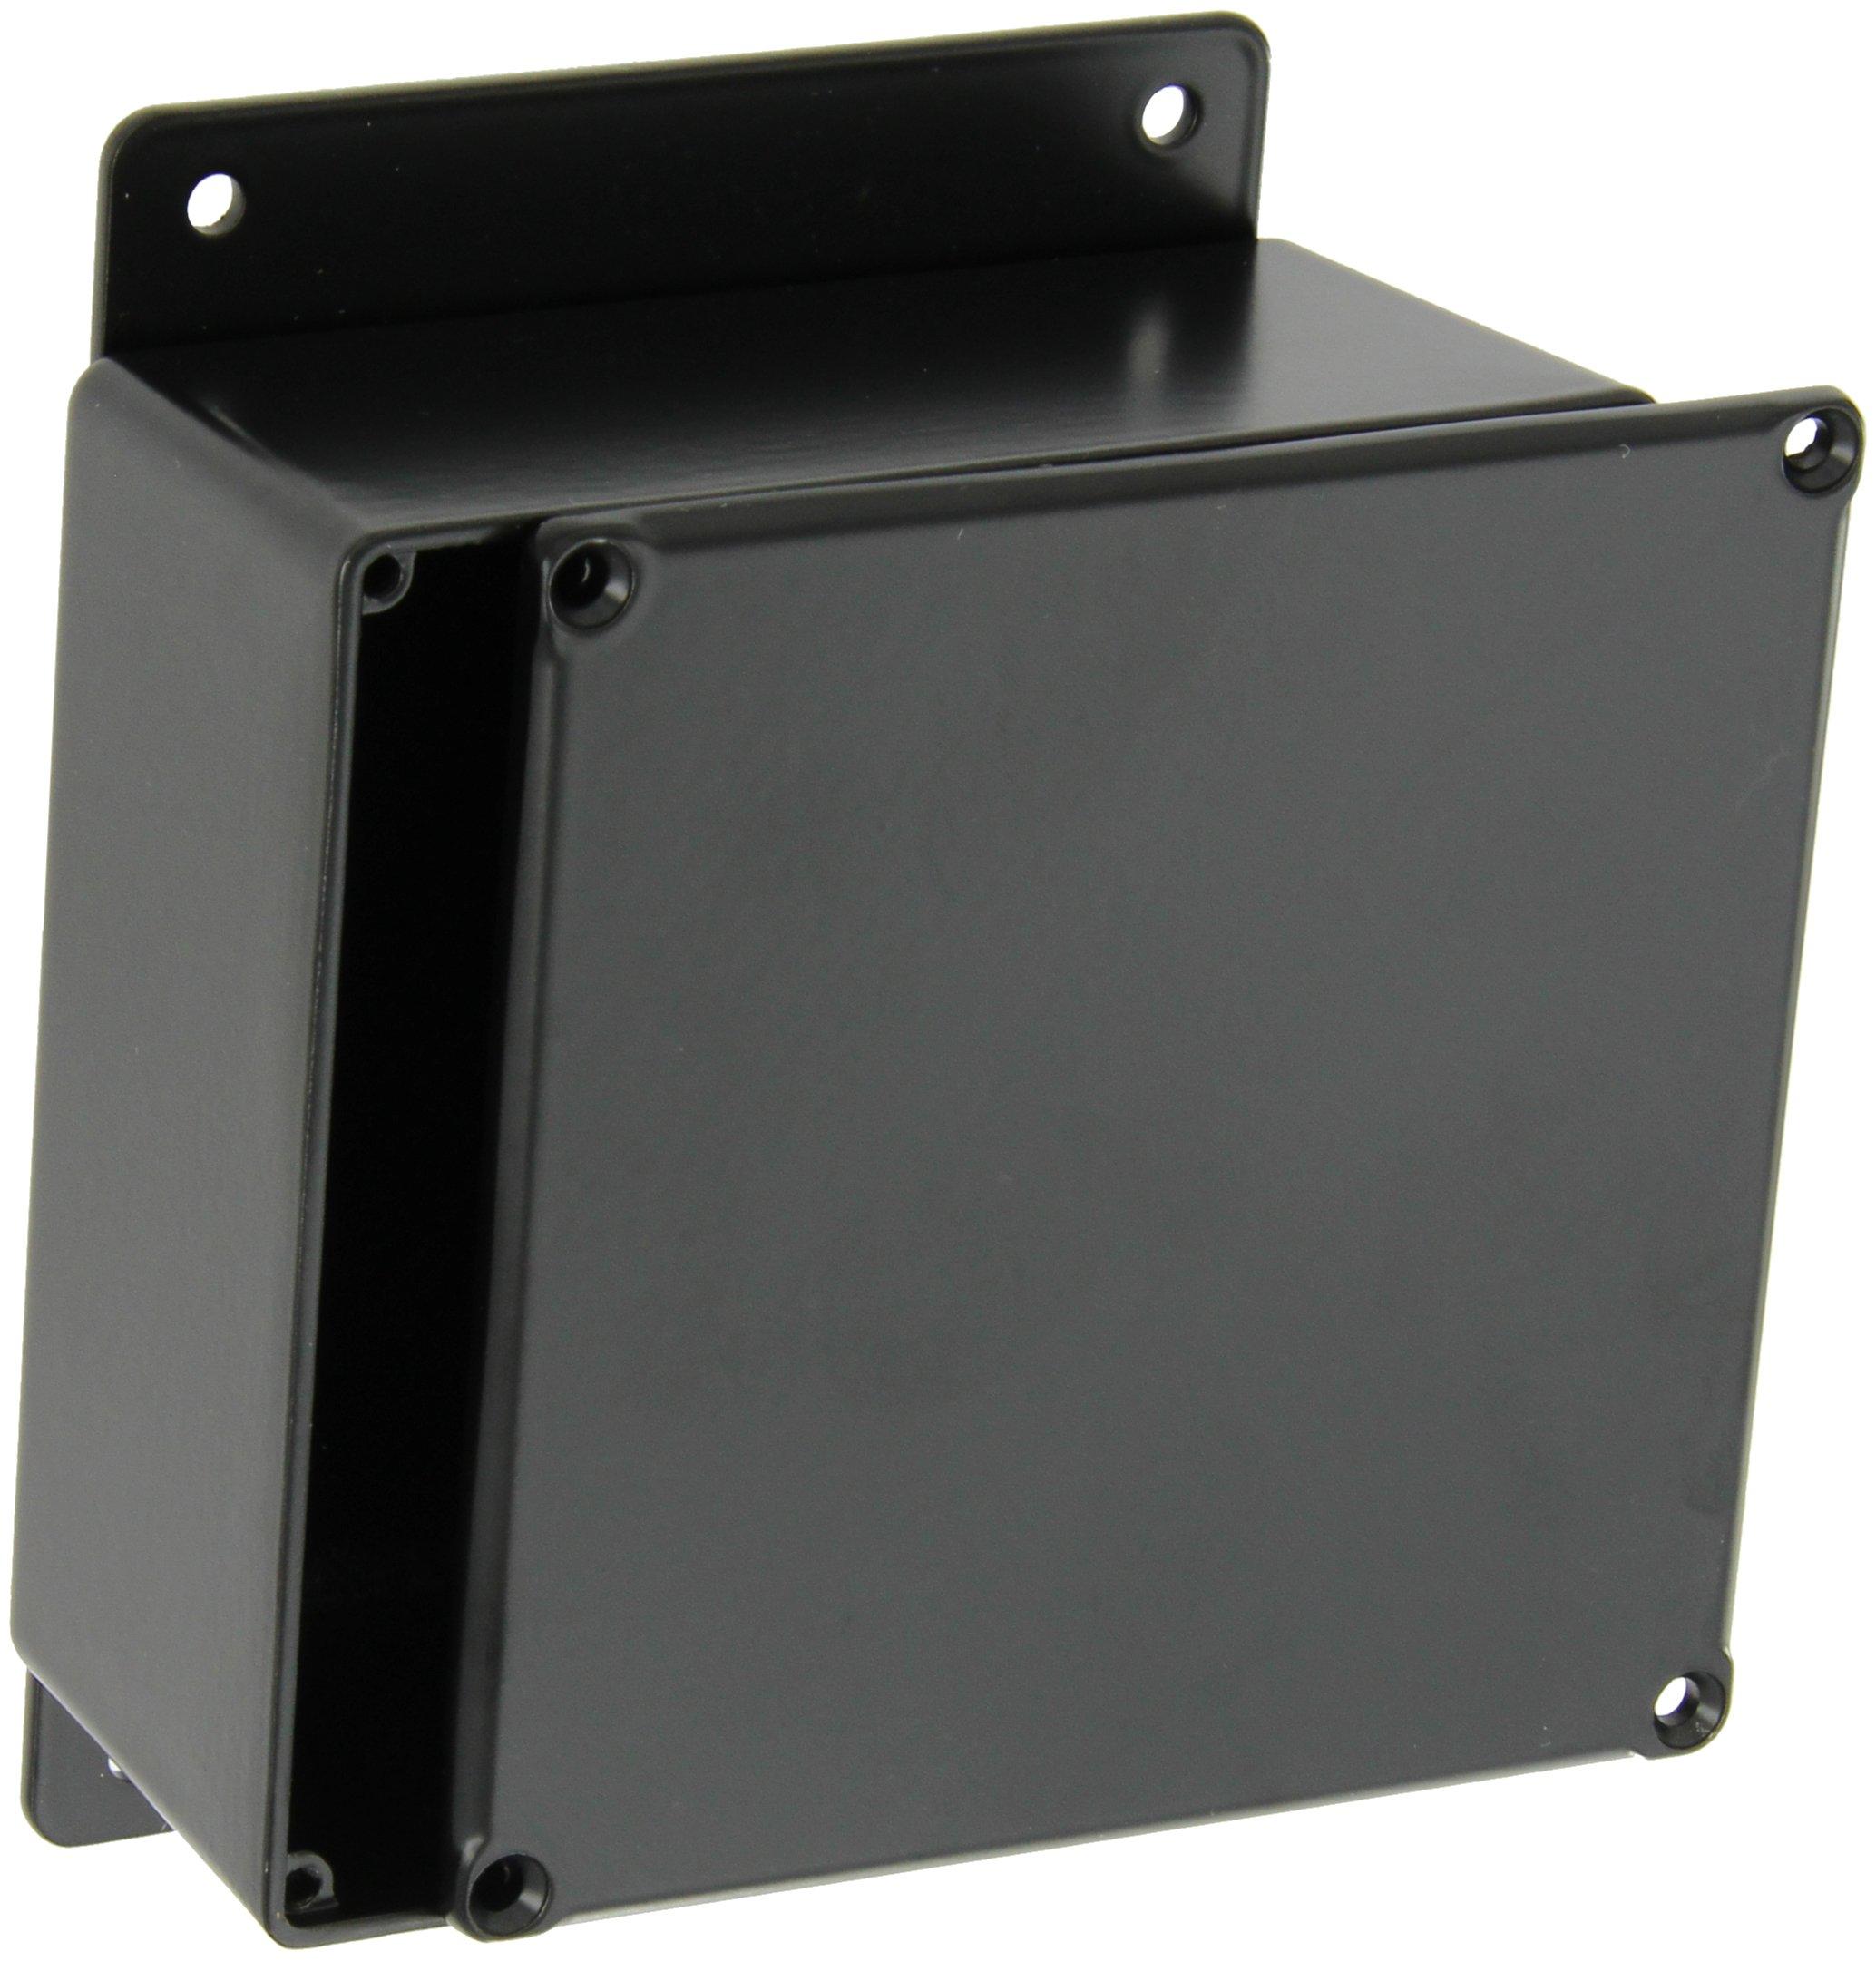 BUD Industries CU-4474-B Die Cast Aluminum Econobox with Mounting Bracket, 4-3/4'' Length x 4-3/4'' Width x 2-21/64'' Height, Black Powdercoat Finish